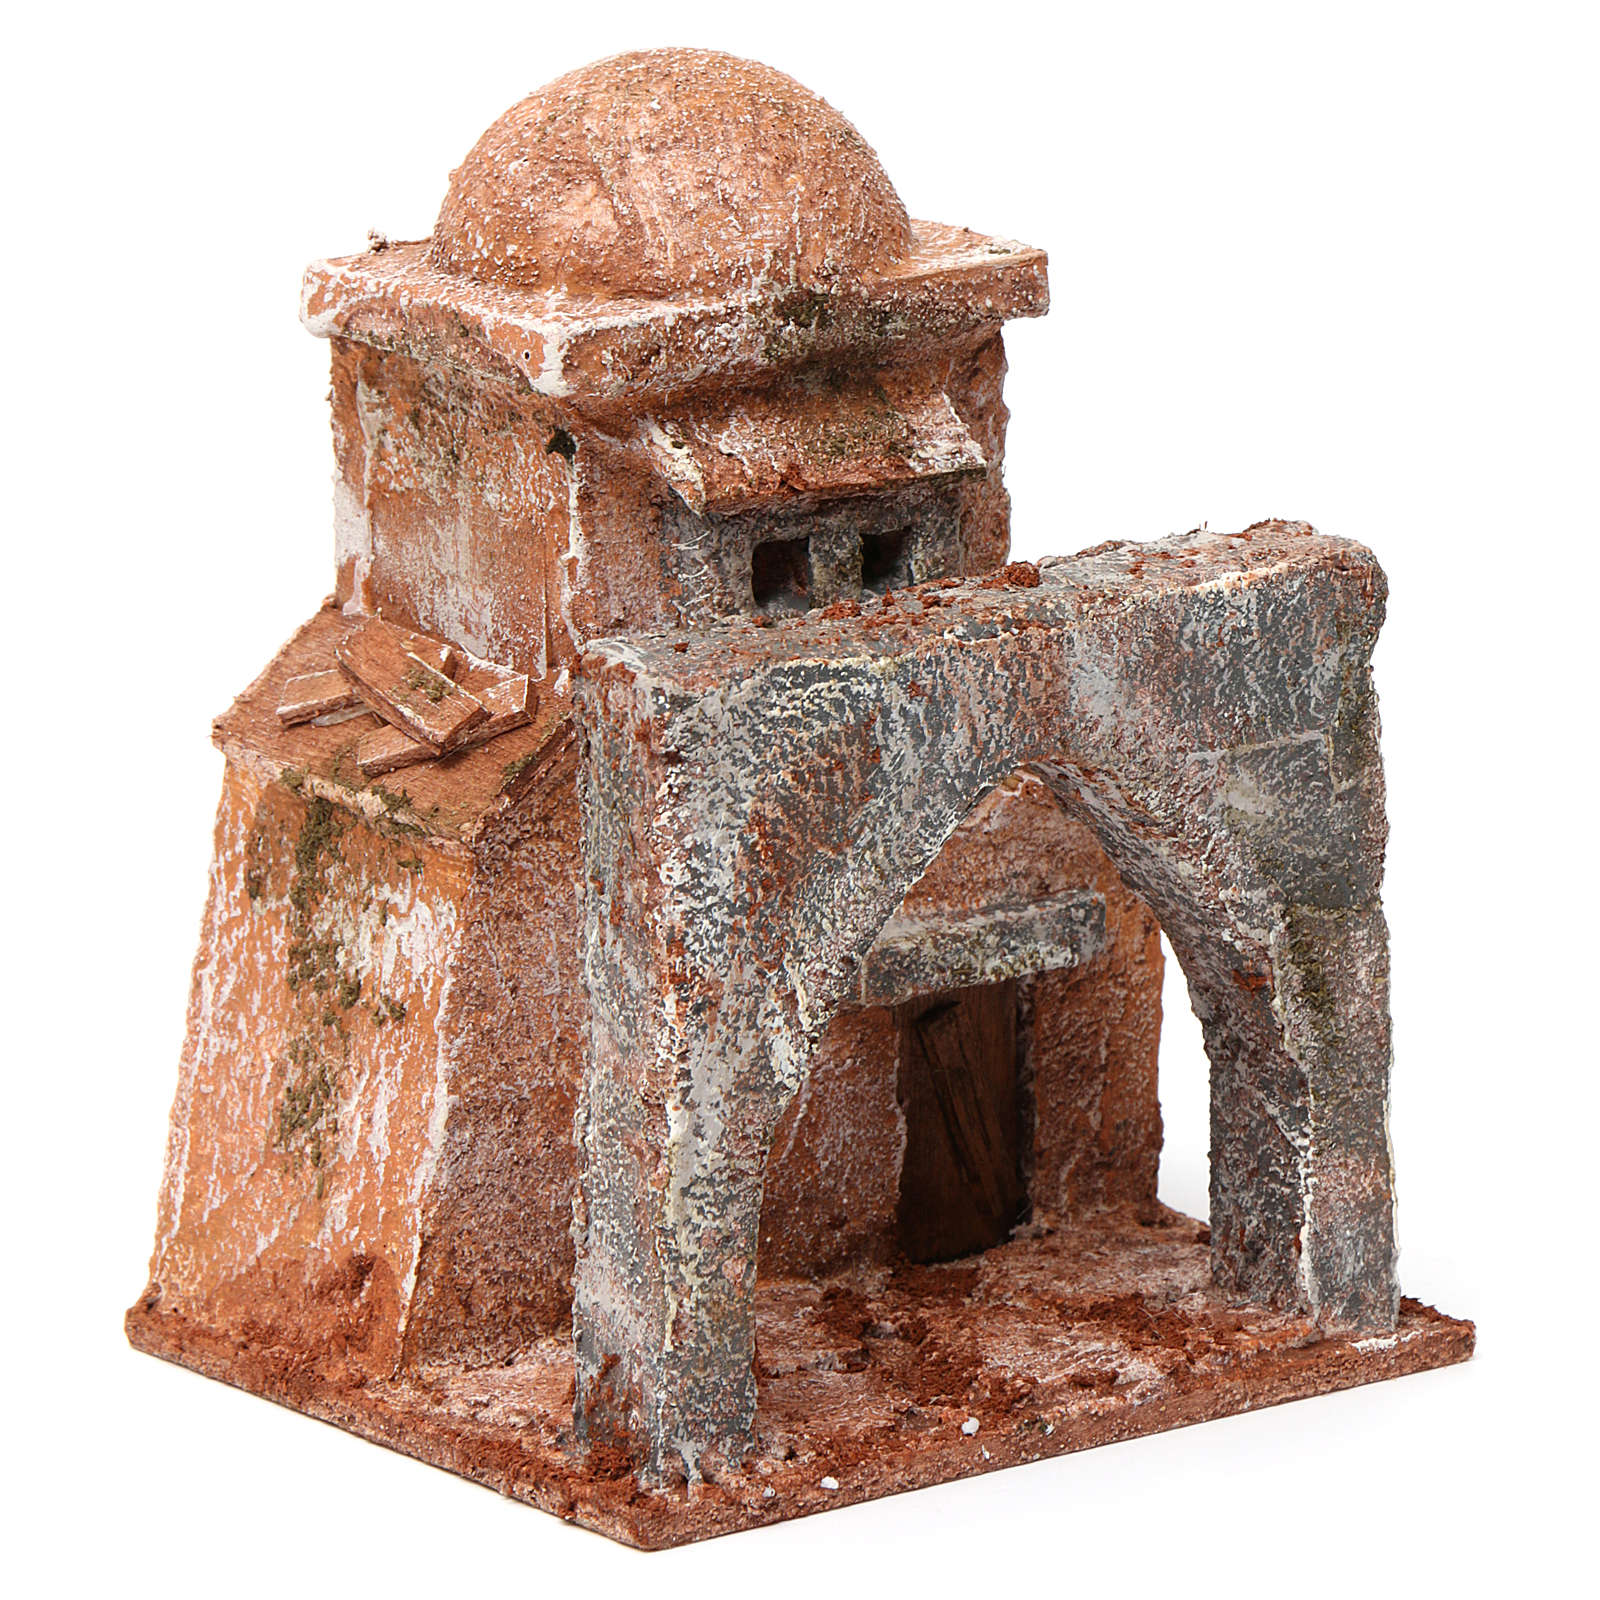 Casa araba piccola porta legno cupola e arco ogivale 10X10X10 cm stile palestinese 4